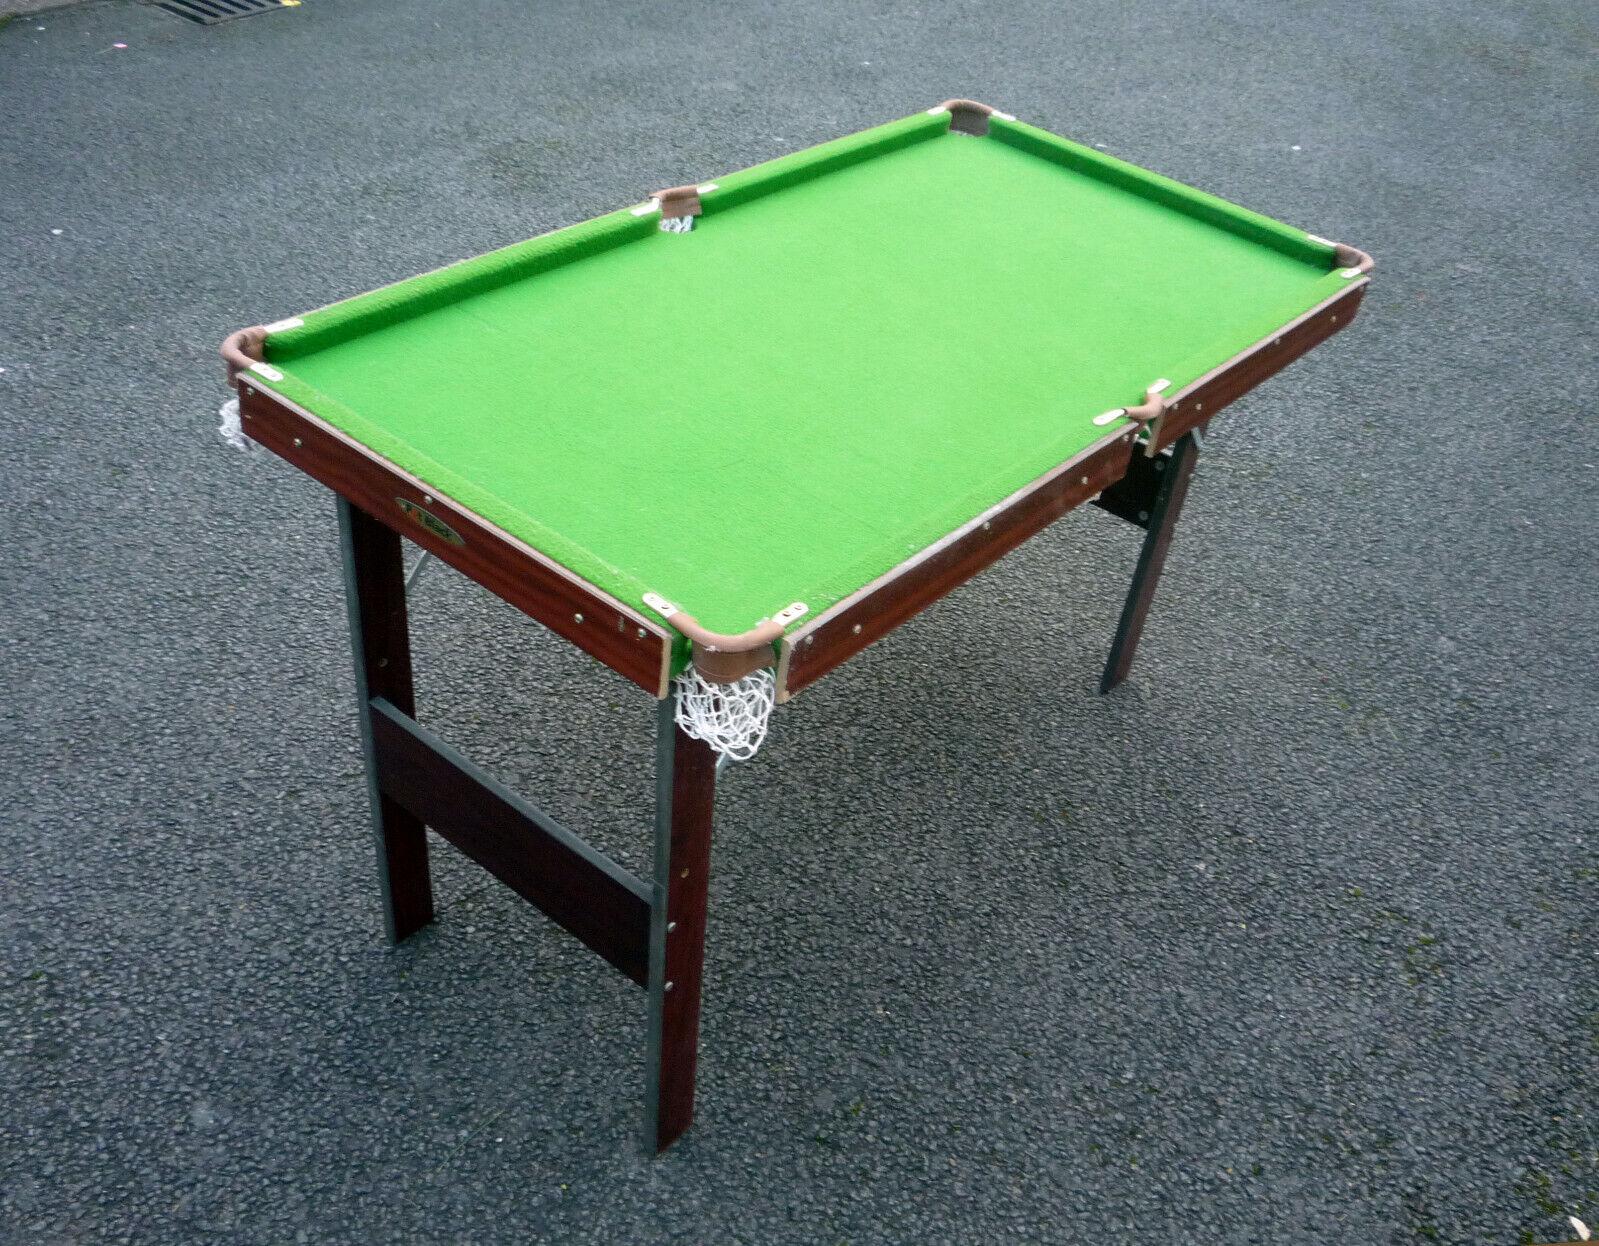 POT BLACK SNOOKER / POOL TABLE 4.5 FOOT w/ CUES x4